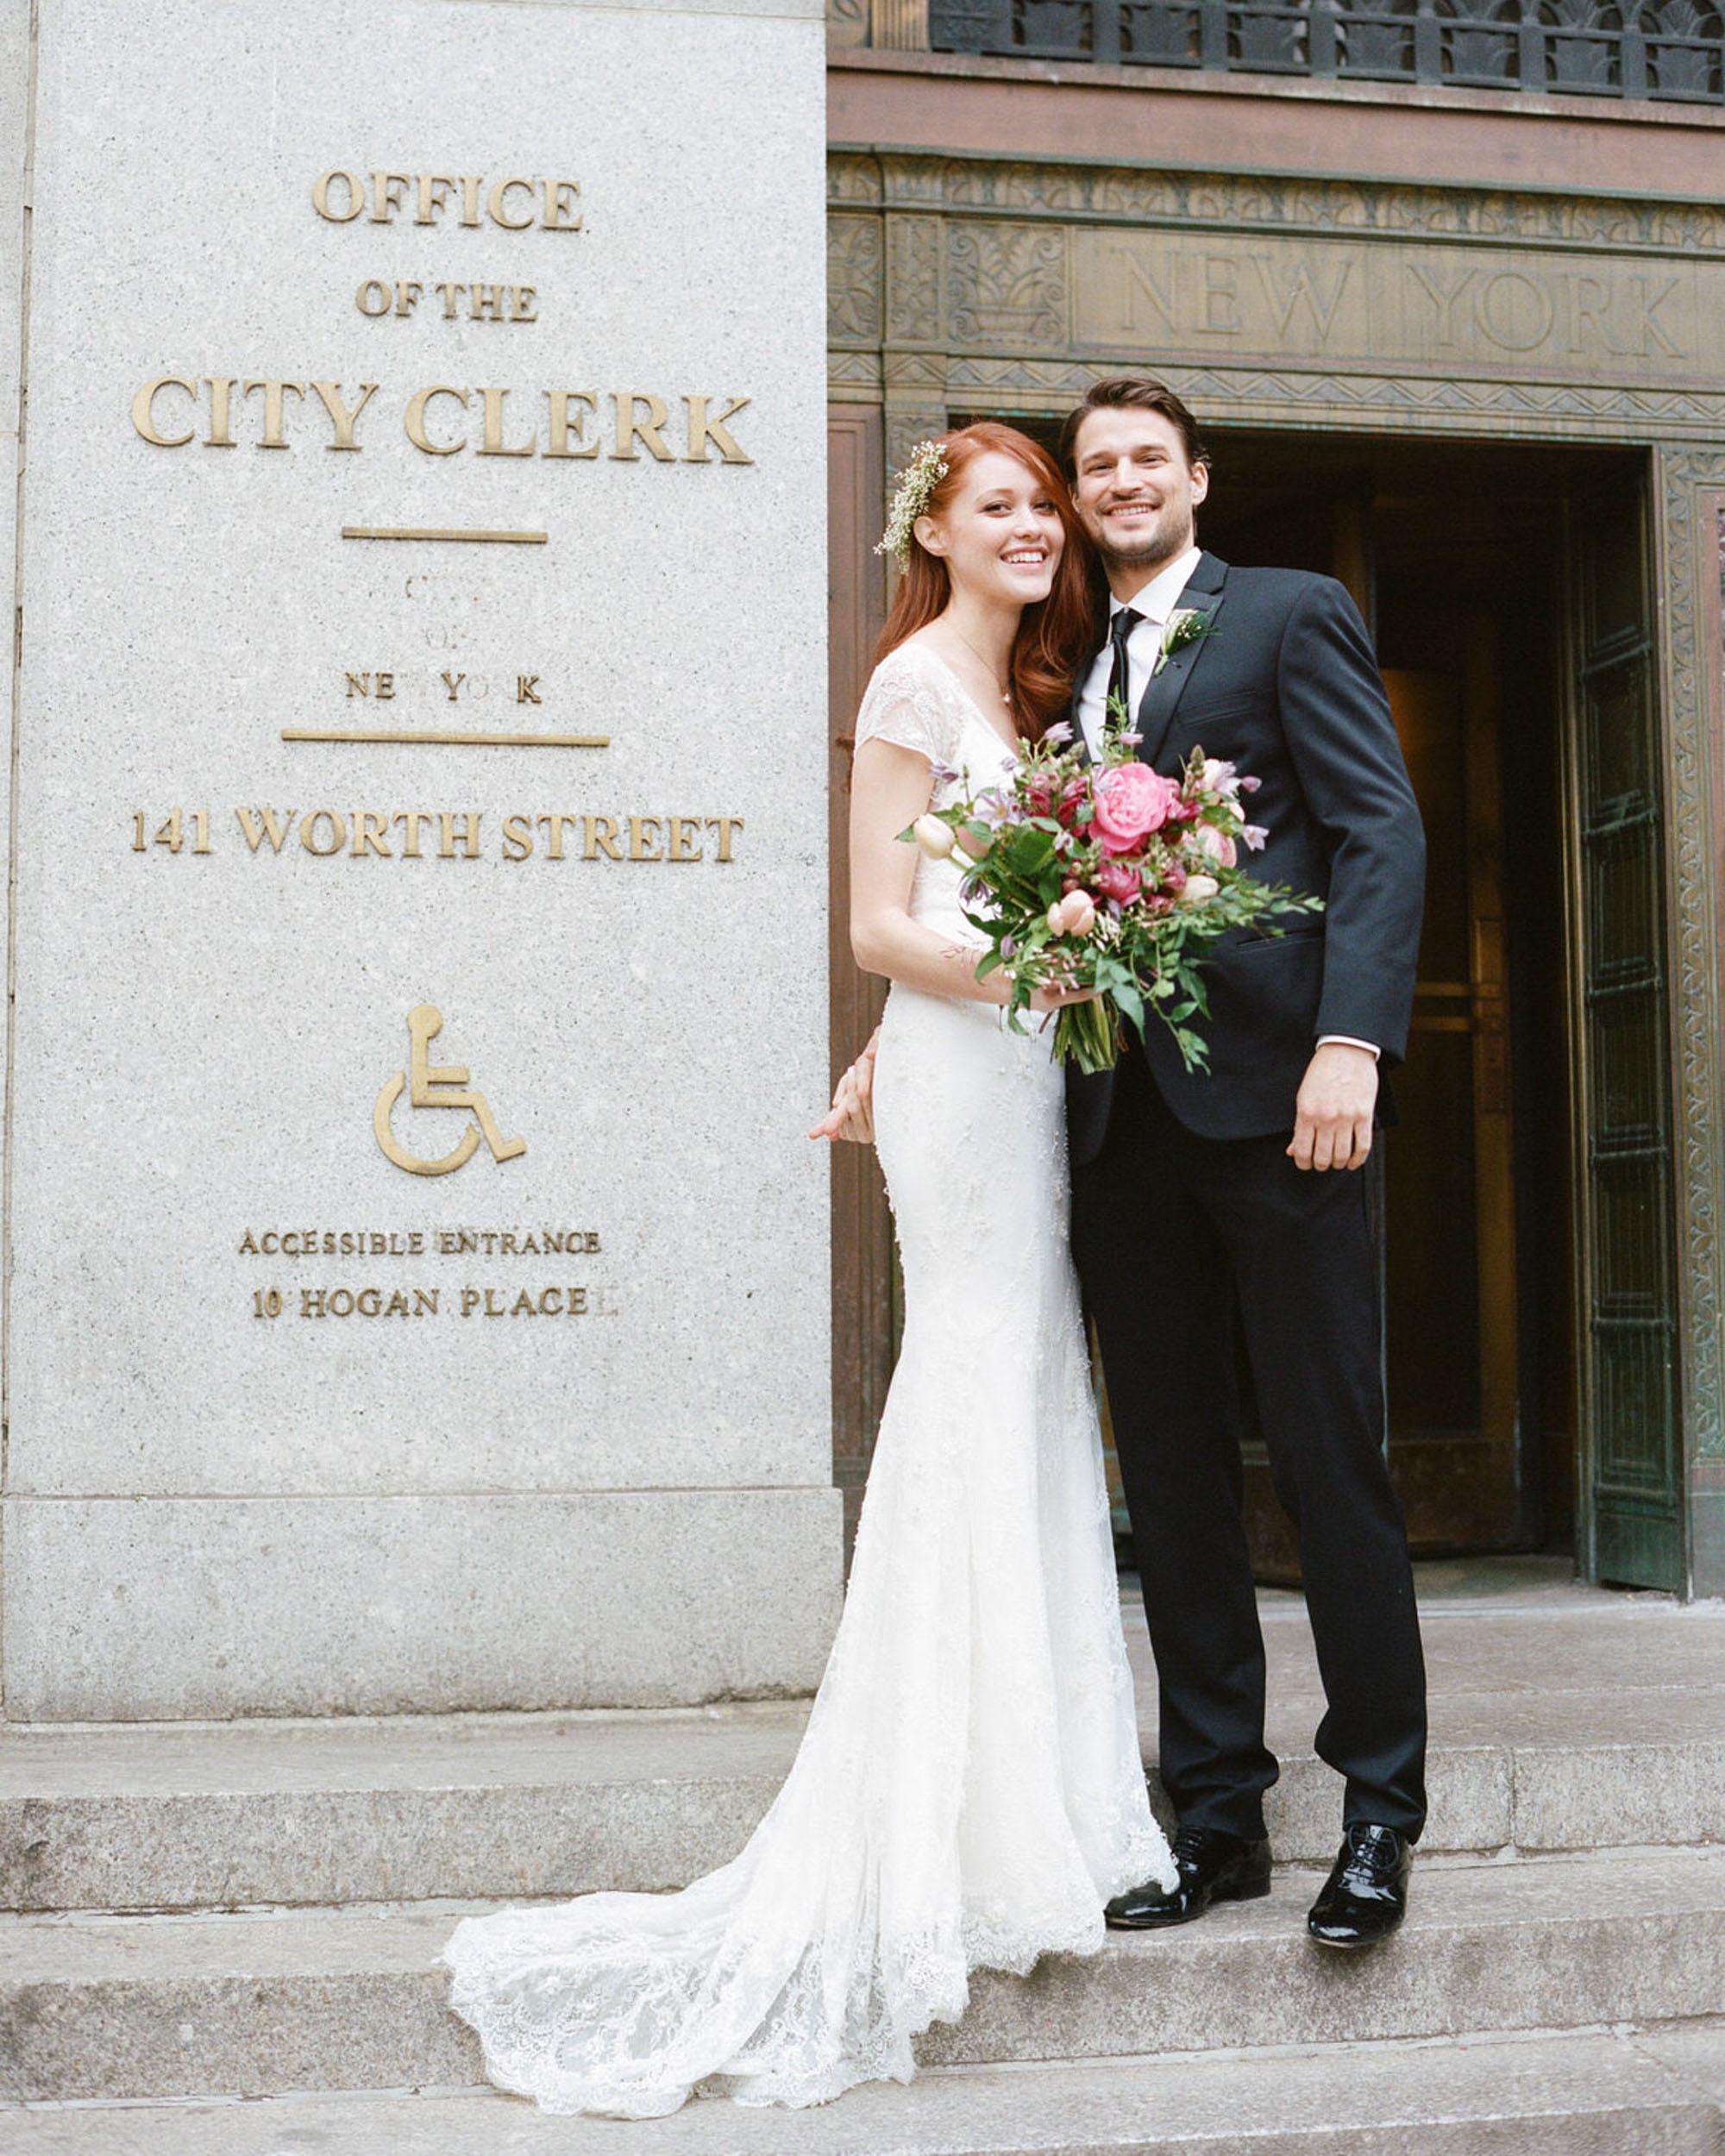 New York City Hall Wedding Photographer 0002 - NYC City Hall